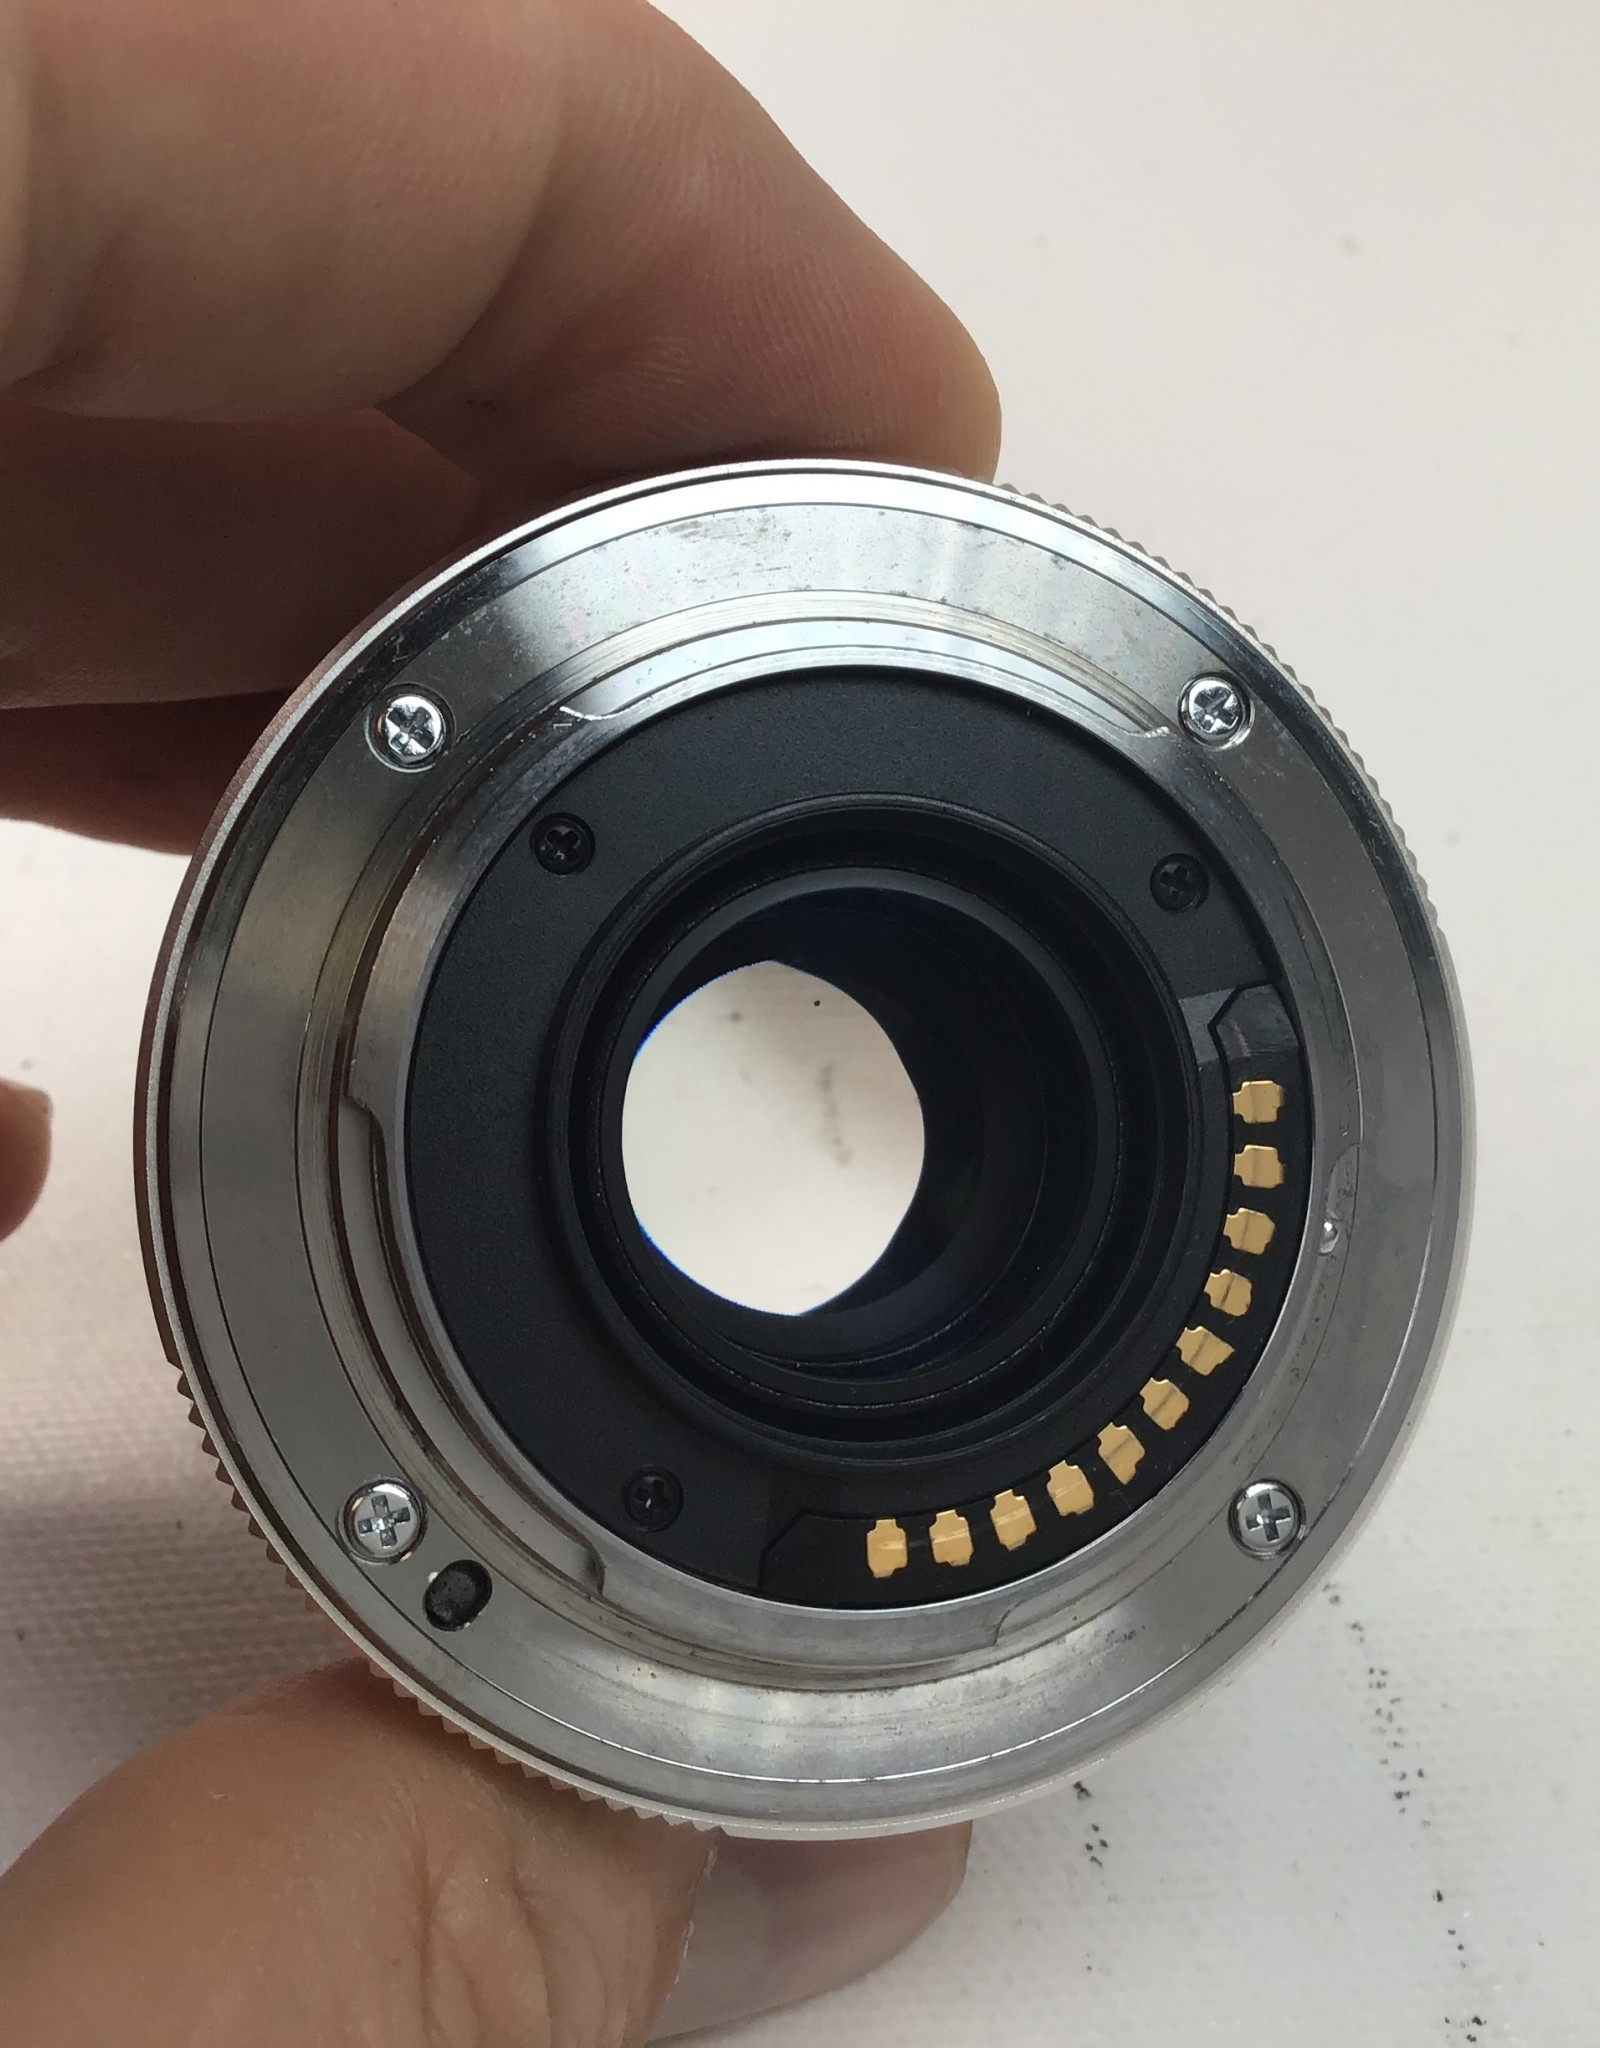 OLYMPUS Olympus M.Zuiko Digital 12mm f:2.0 lens Used Good